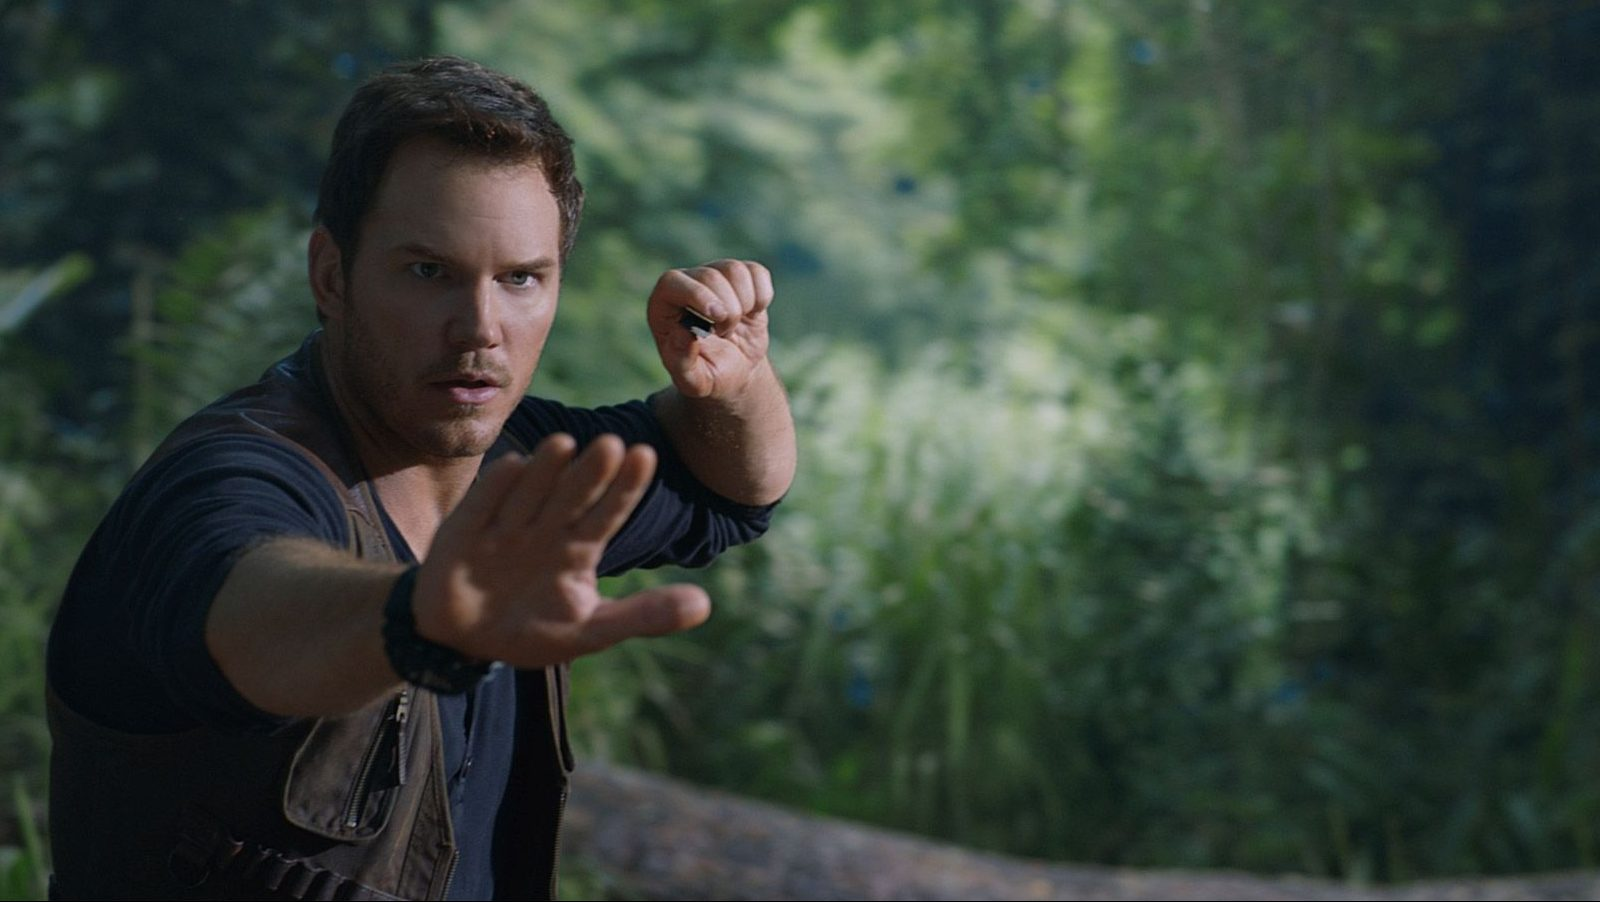 Chris Pratt holds up hand to stop dinosaur